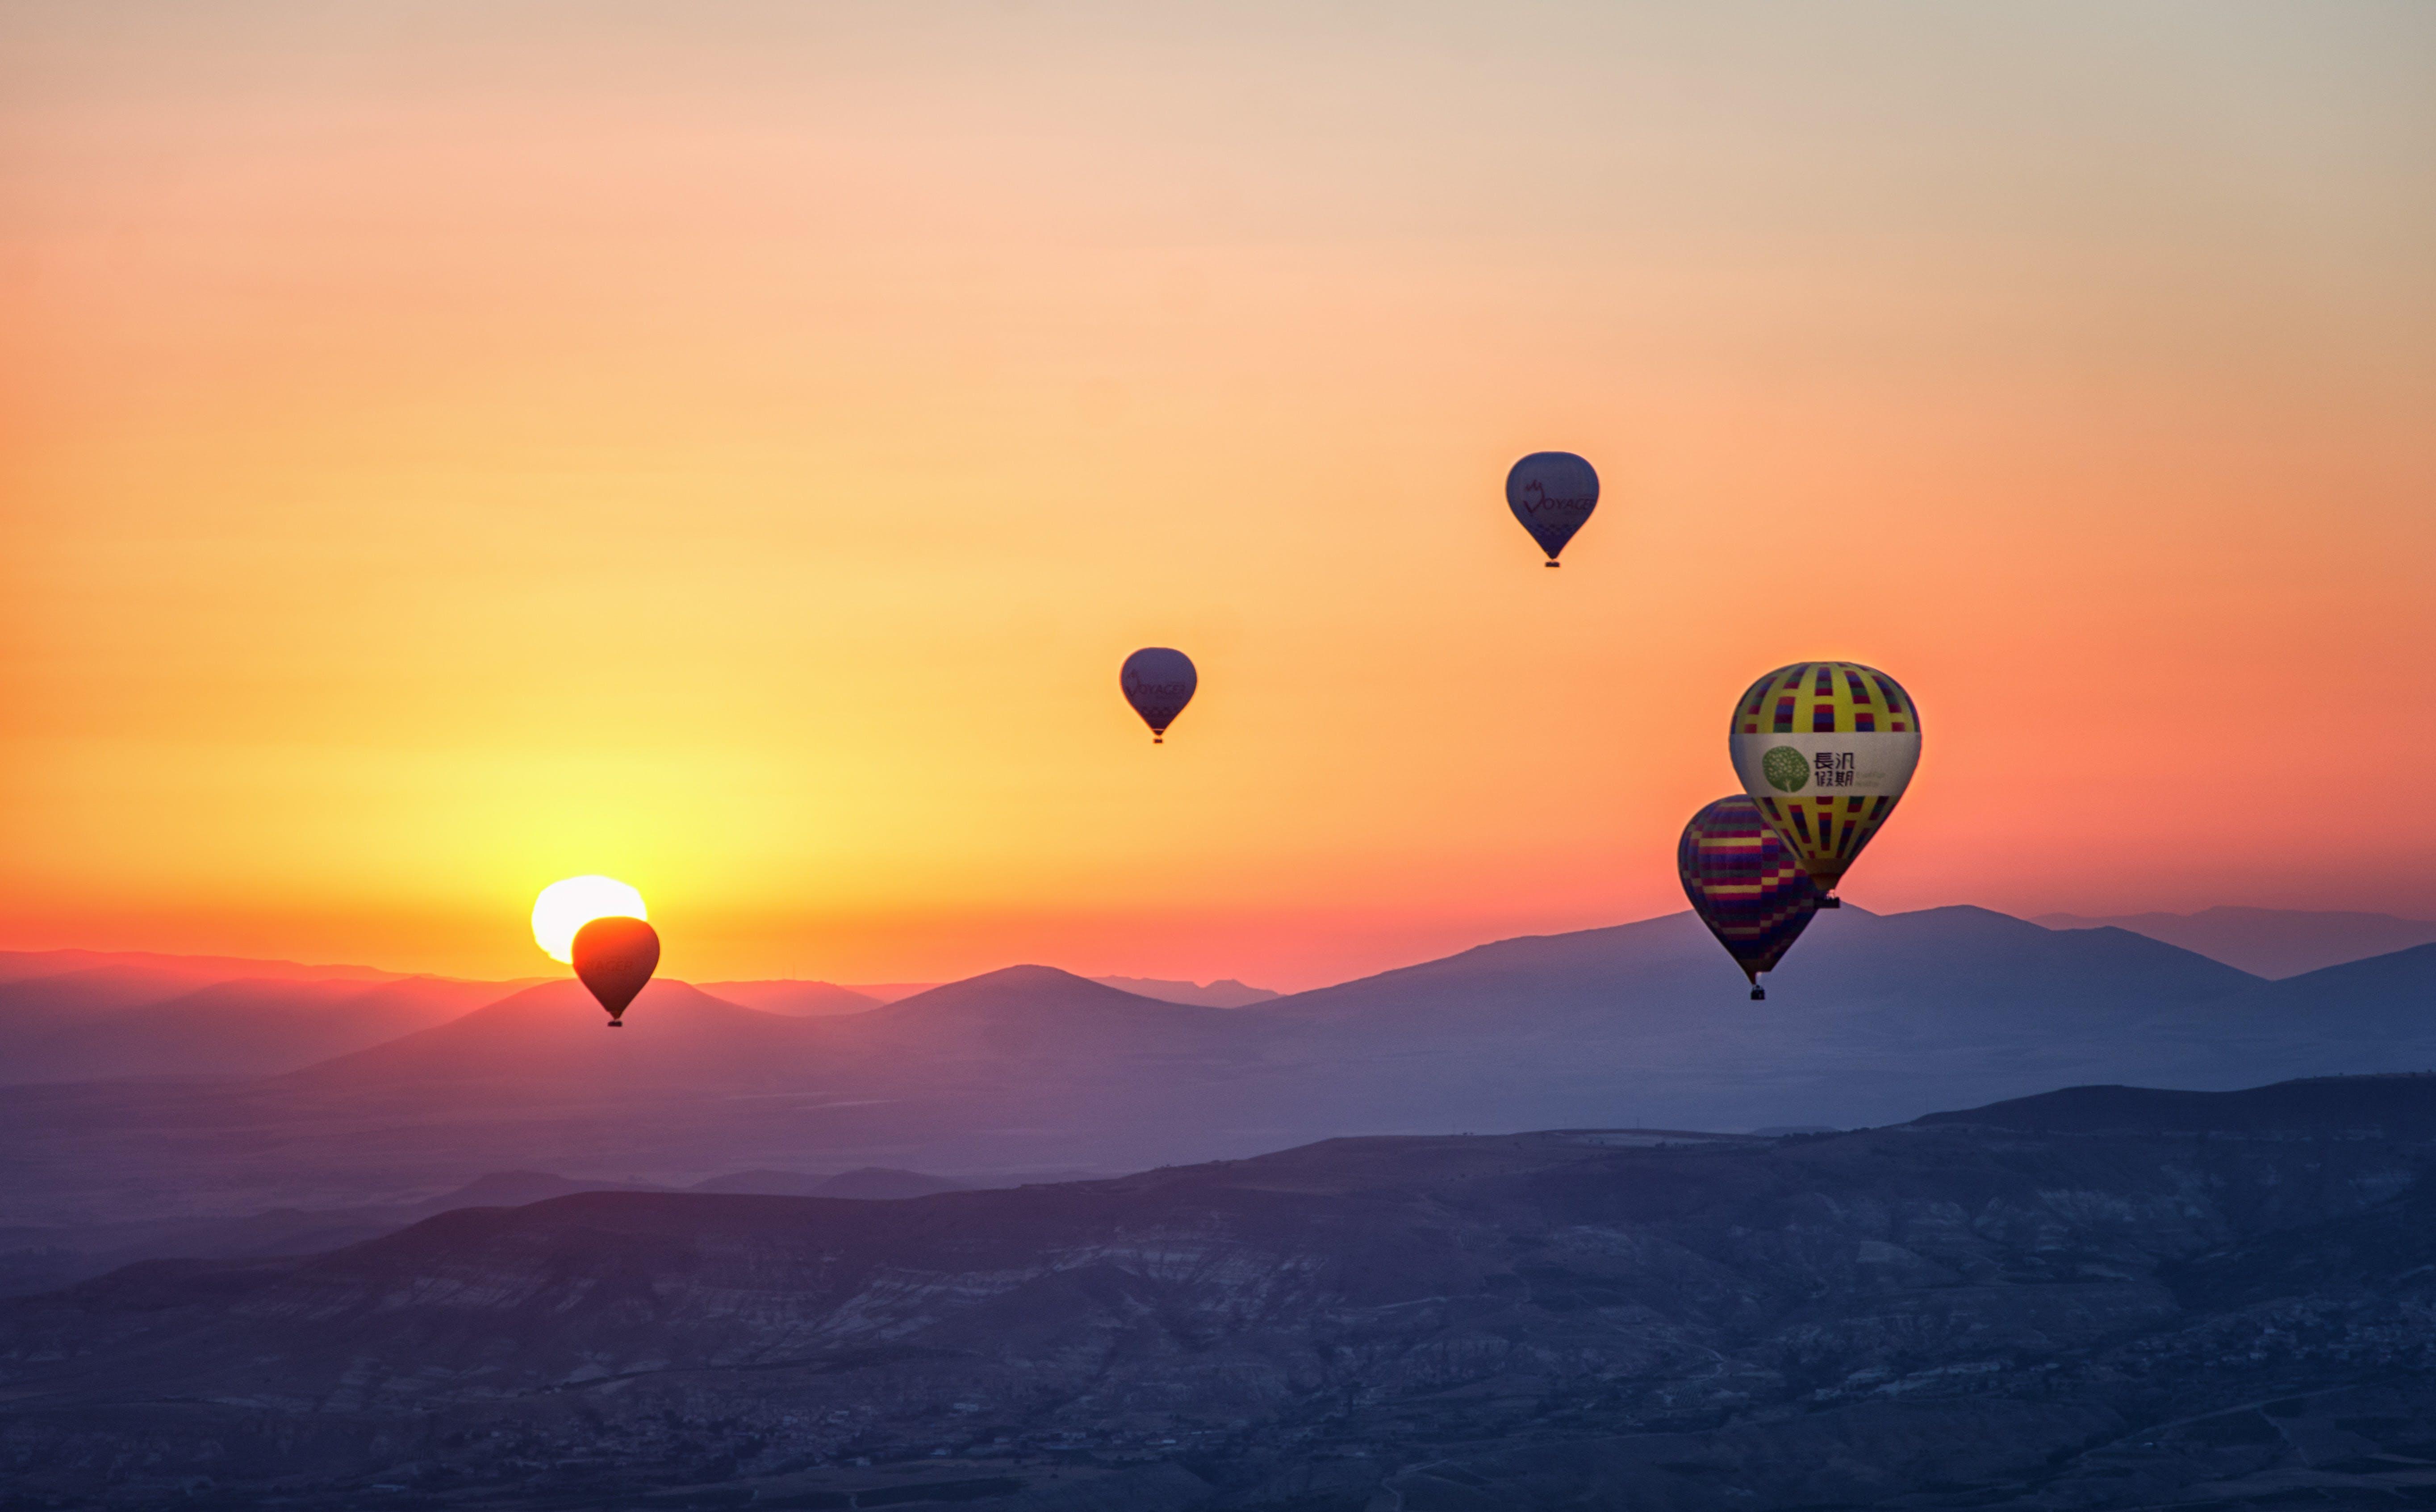 Kostenloses Stock Foto zu flug, dämmerung, landschaft, himmel